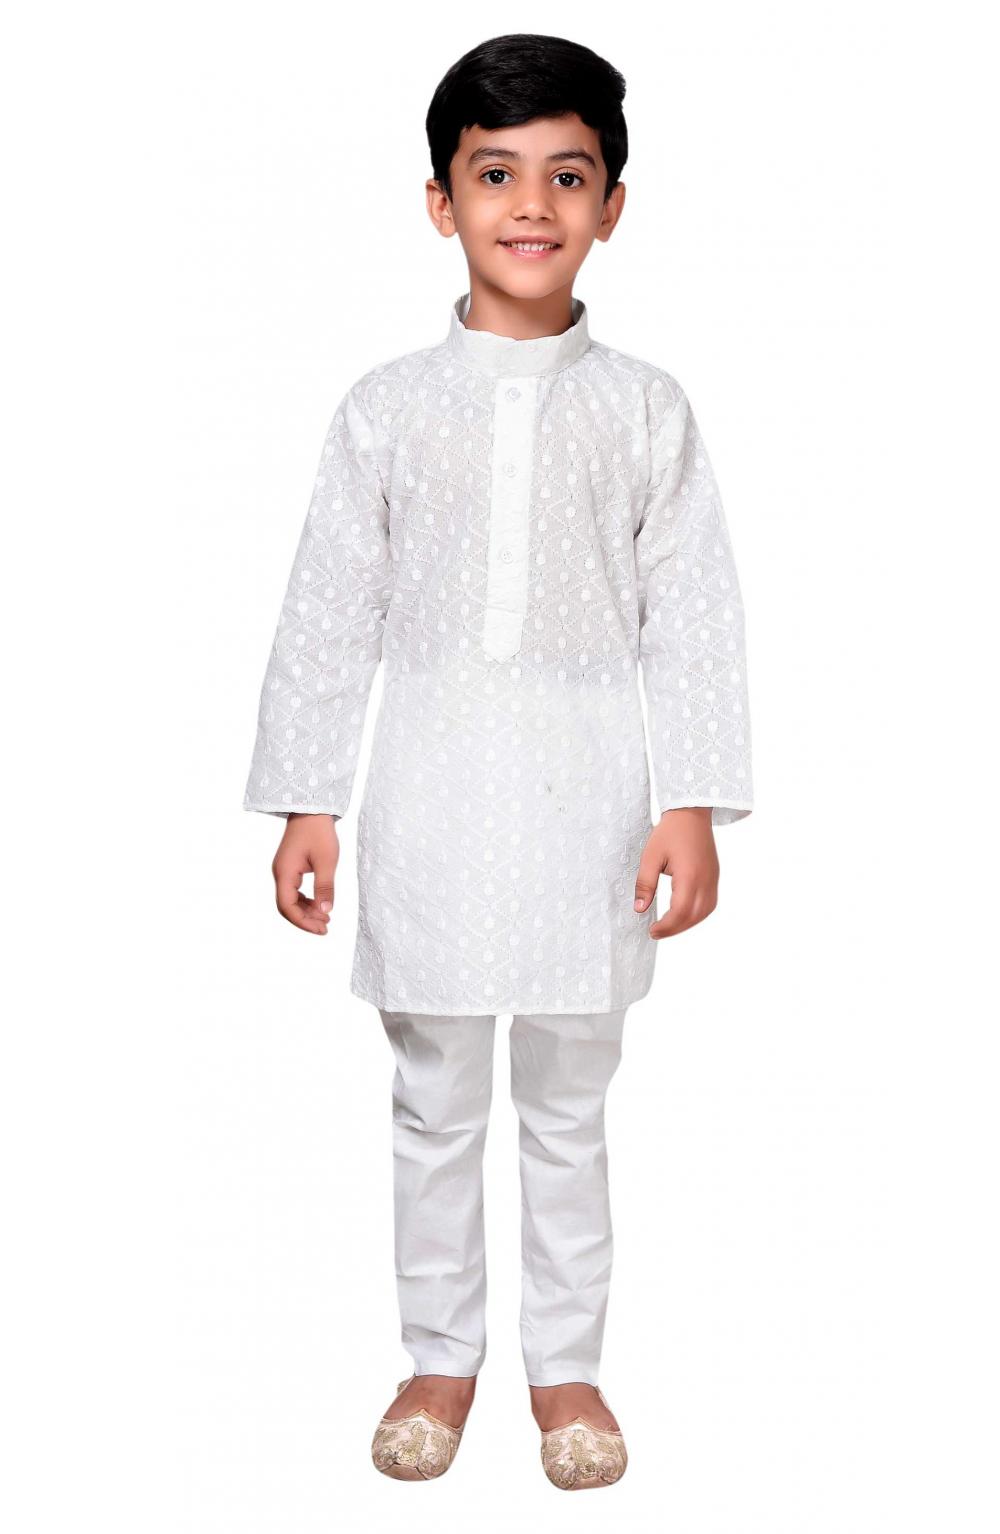 04e1ff9ab Boys Indian White Cotton Sherwani Kurta Churidar Salwar Kameez for ...